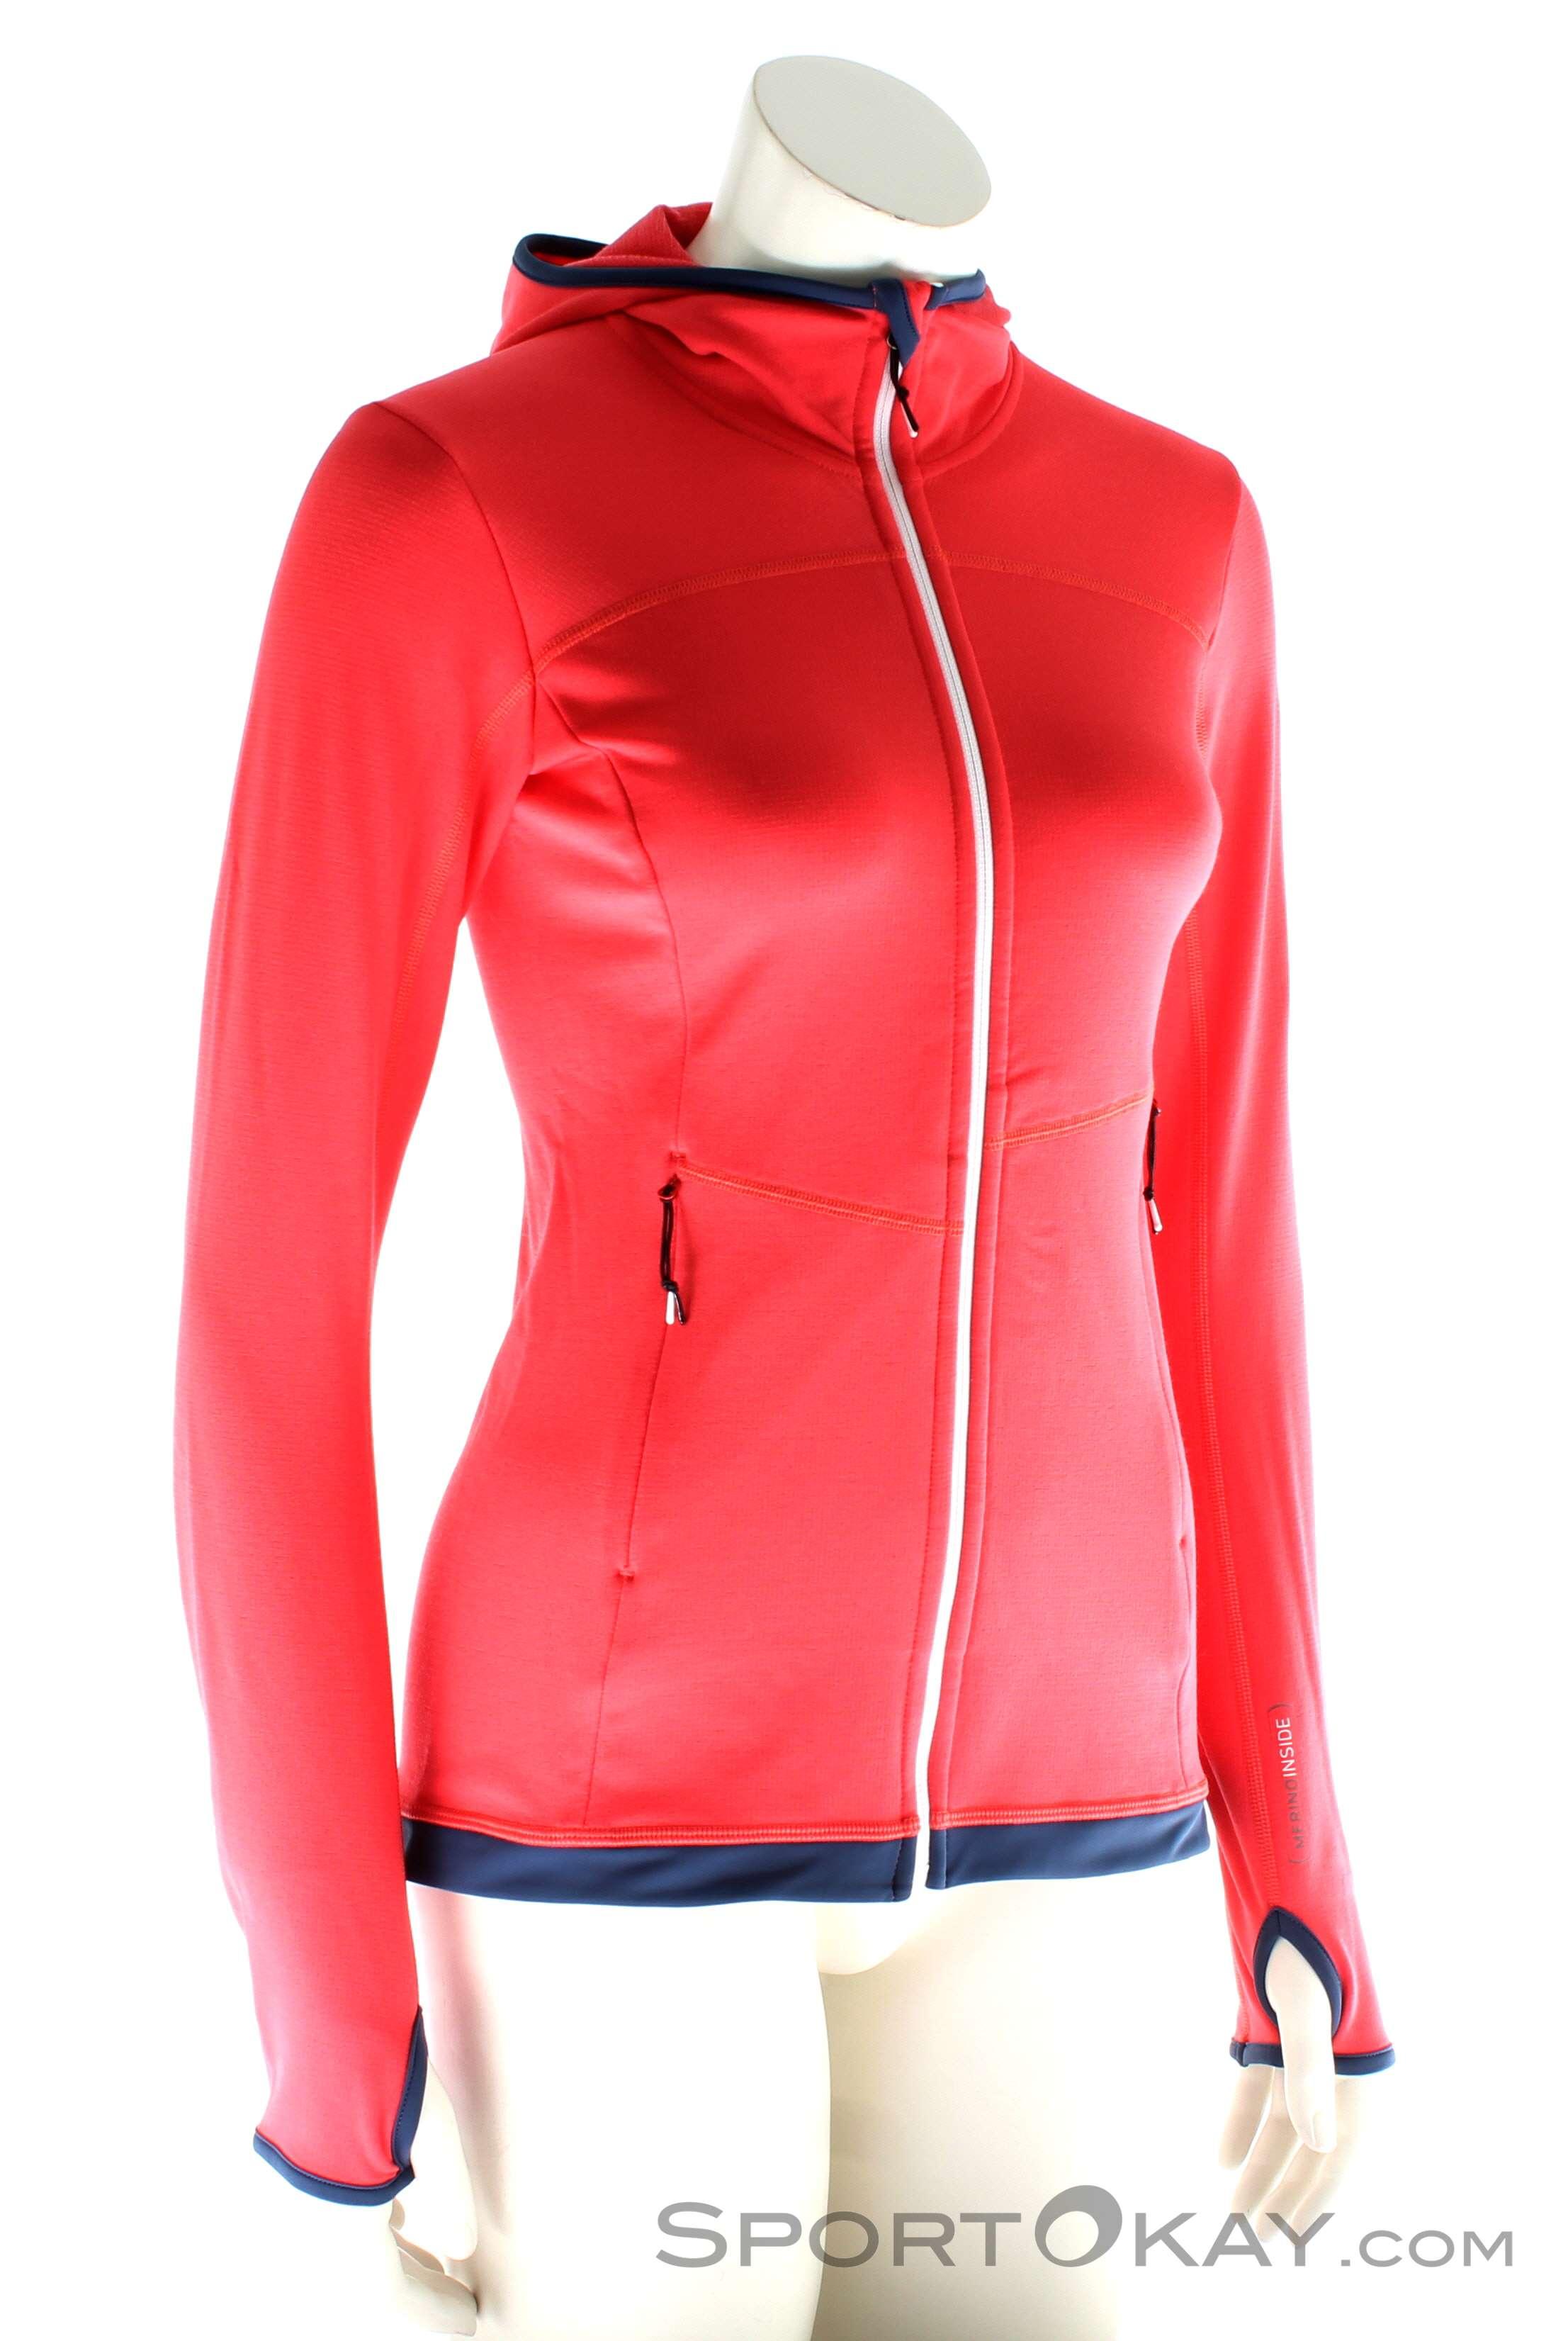 Ortovox Fleece Light Hoody Damen Tourensweater, Ortovox, Pink-Rosa, , Damen, 0016-10578, 5637580009, 4250875282896, N1-01.jpg